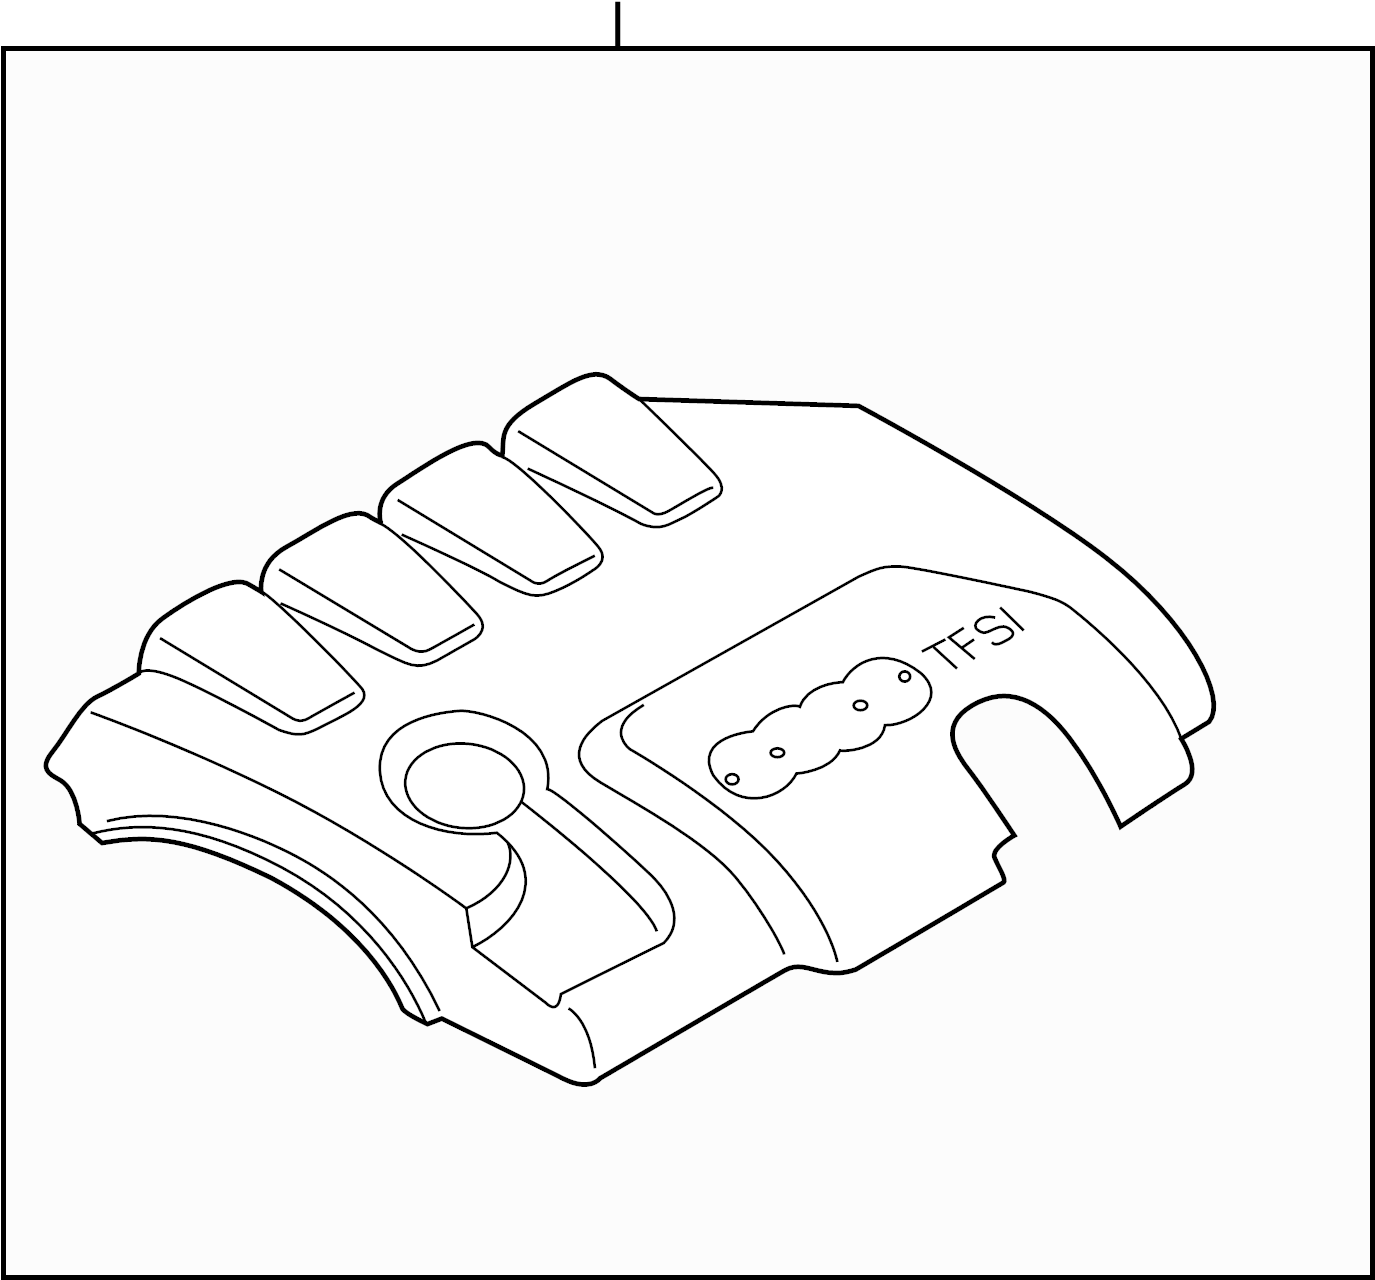 2011 Audi A4 Engine: 2011 Audi A4 Engine Cover. LITER, TRANSAXLE, APPEARANCE